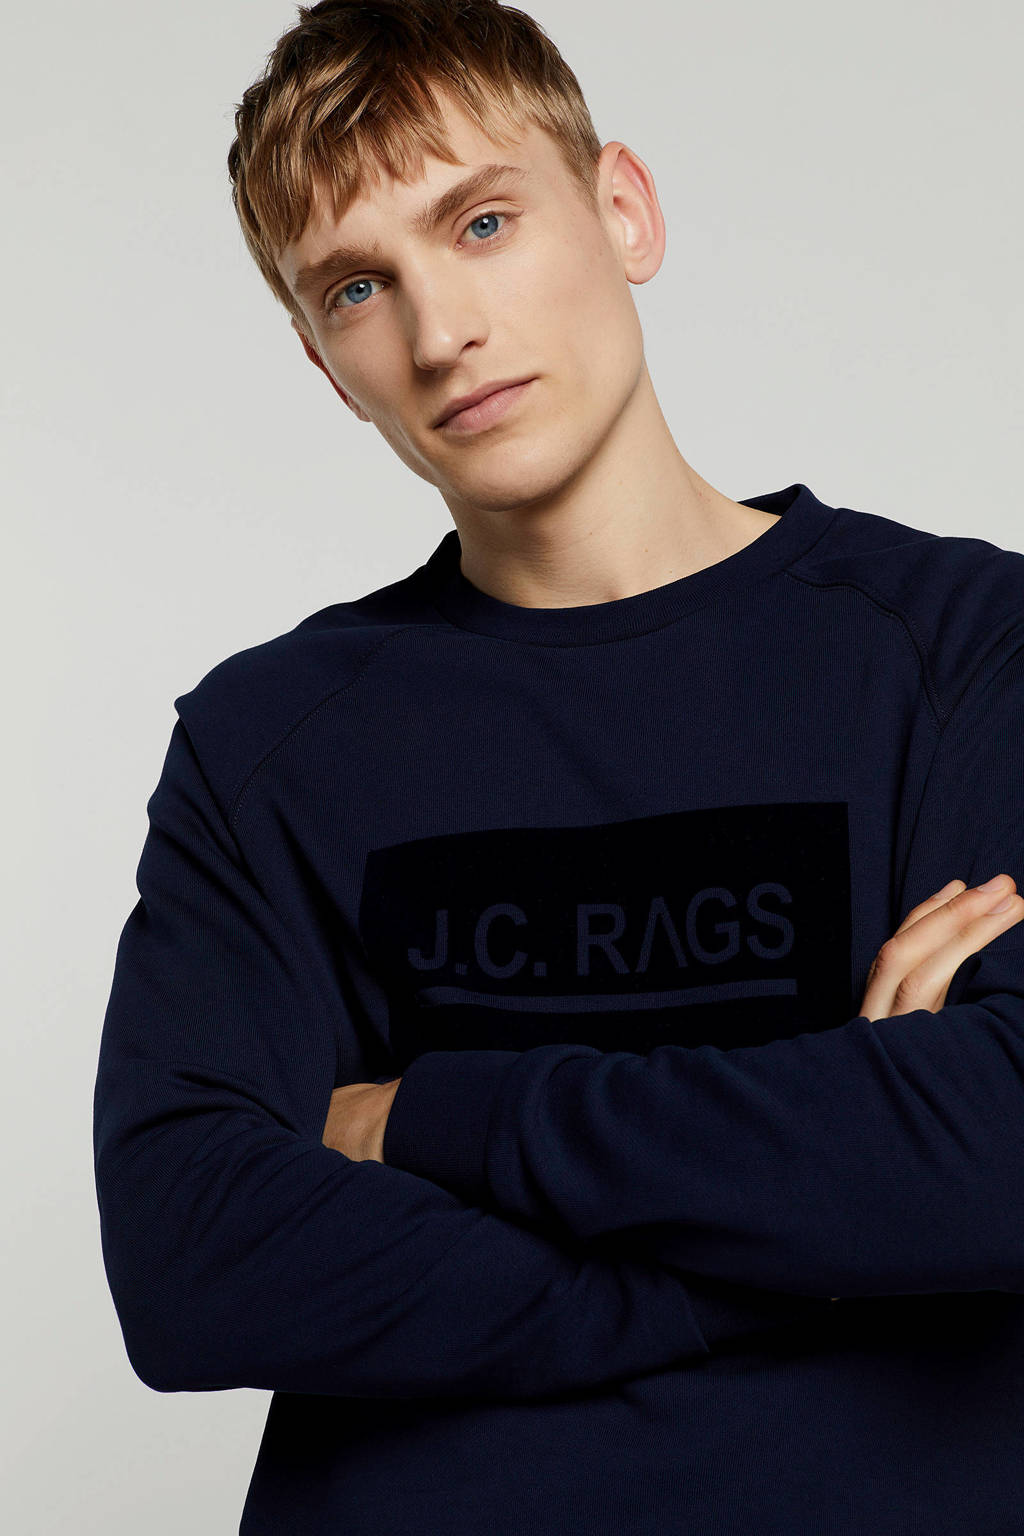 J.C. Rags sweater, Donkerblauw